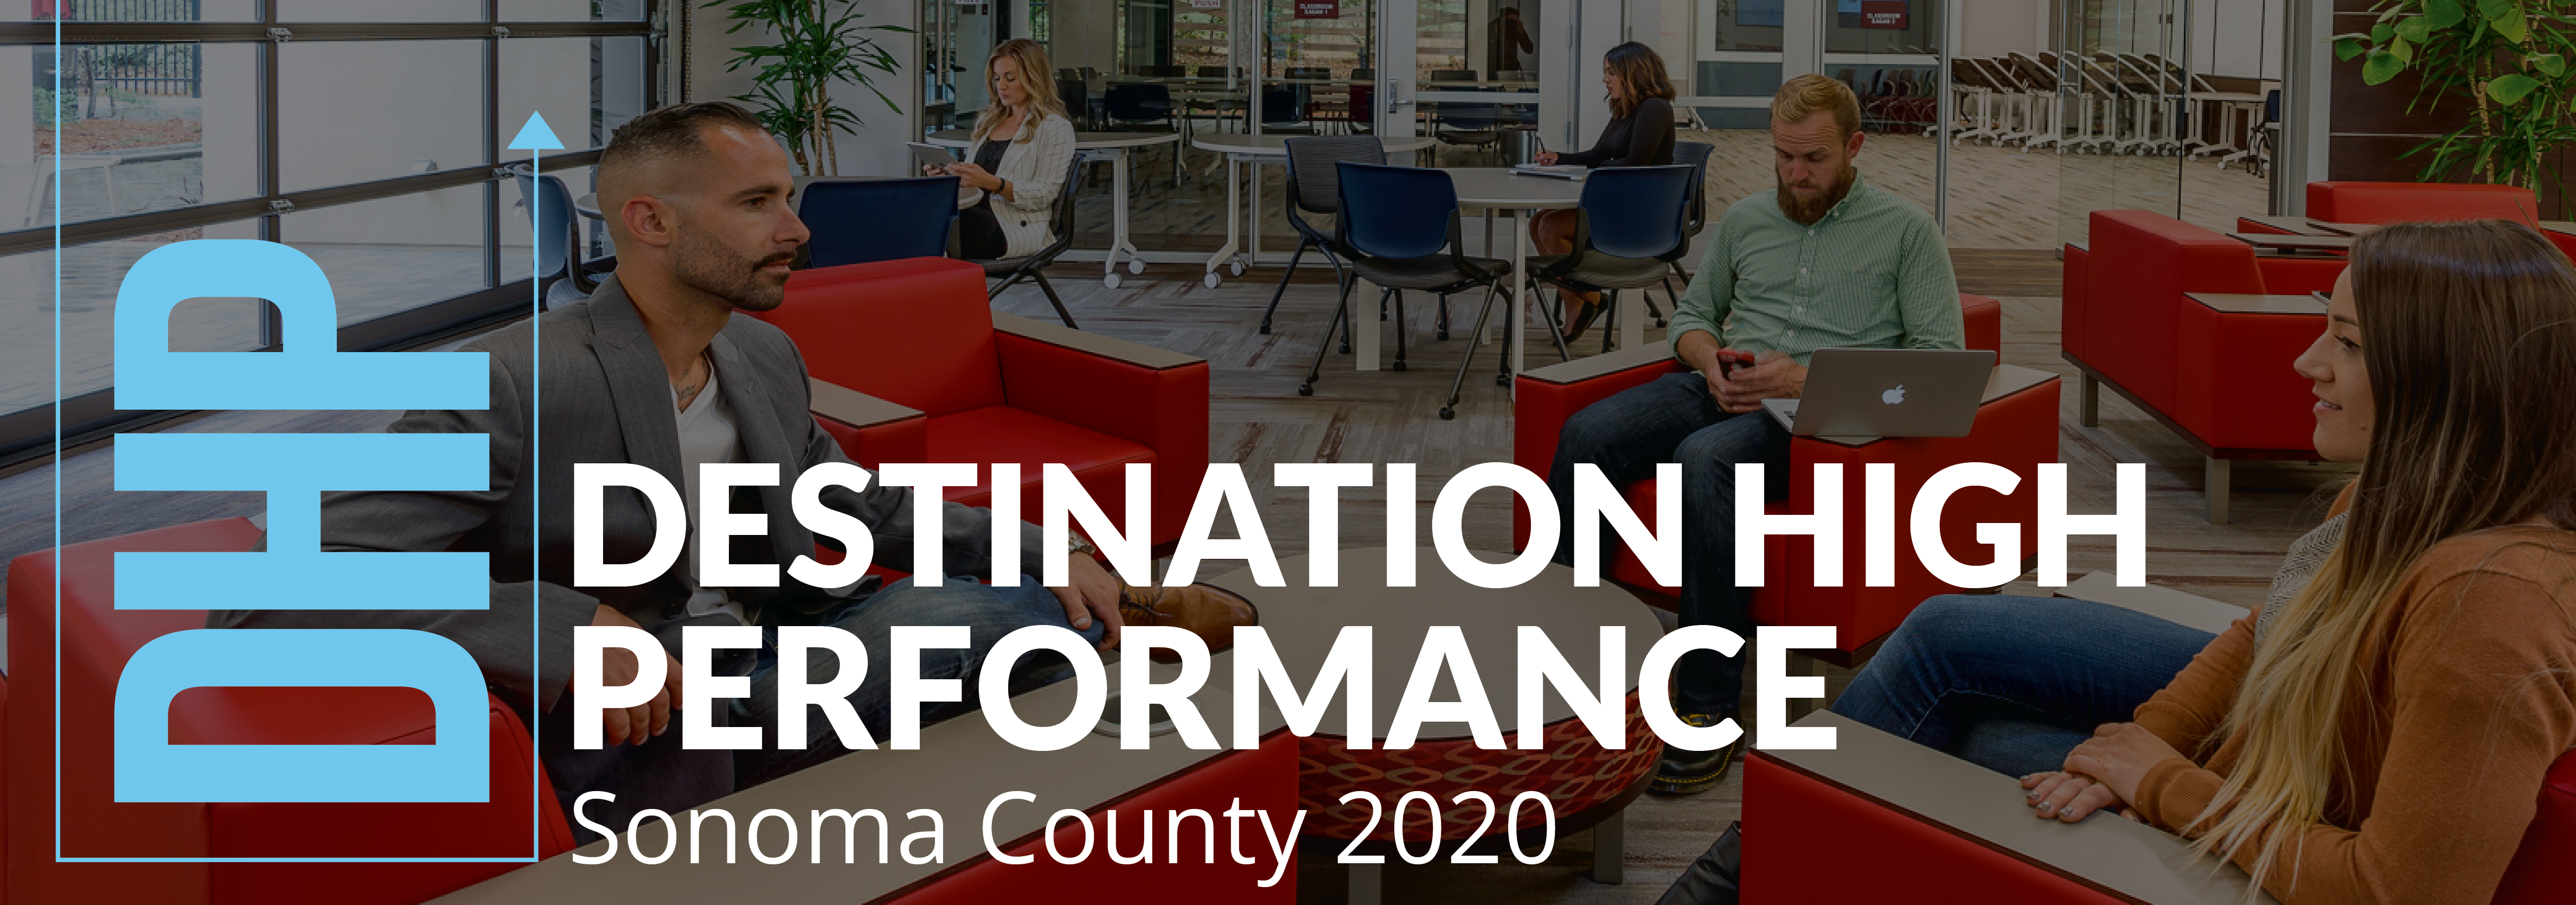 Destination High Performance Sonoma County 2020 Header Image